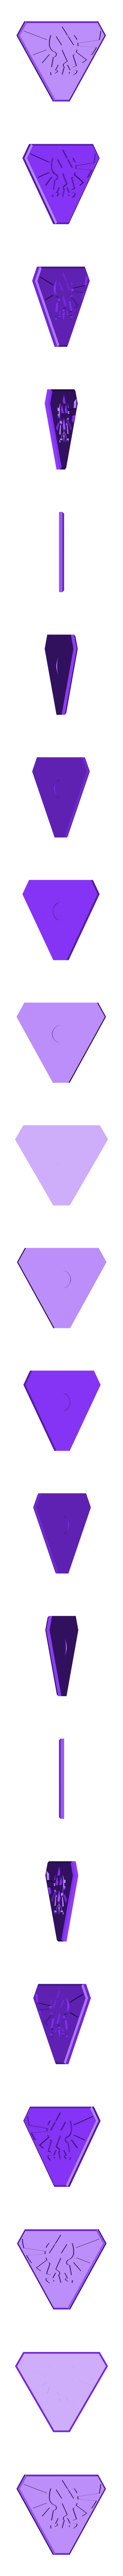 triangle_zelda.stl Download STL file Hand Spinner Zelda • Template to 3D print, Guich